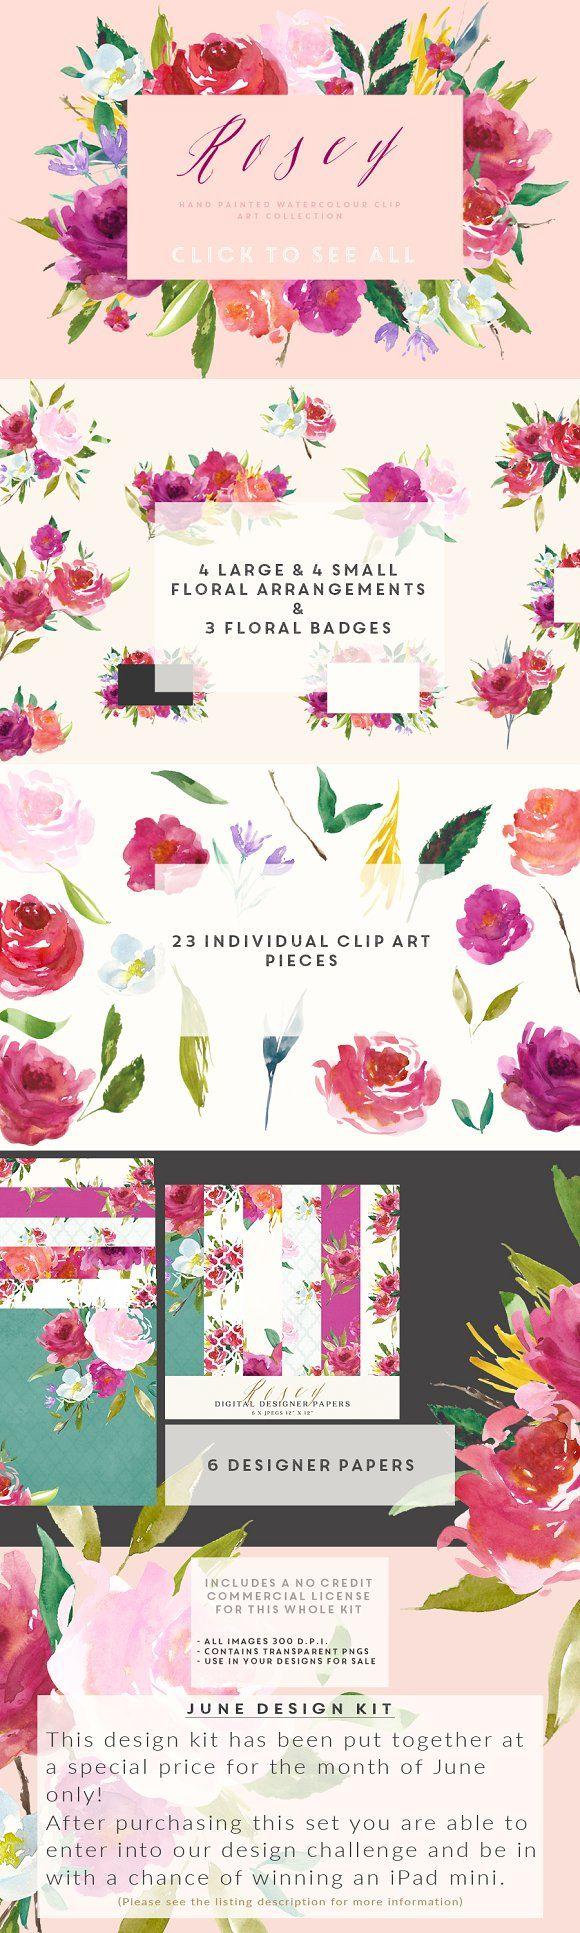 Watercolour Flower Clip Art - Rosey by CreateTheCut on @creativemarket